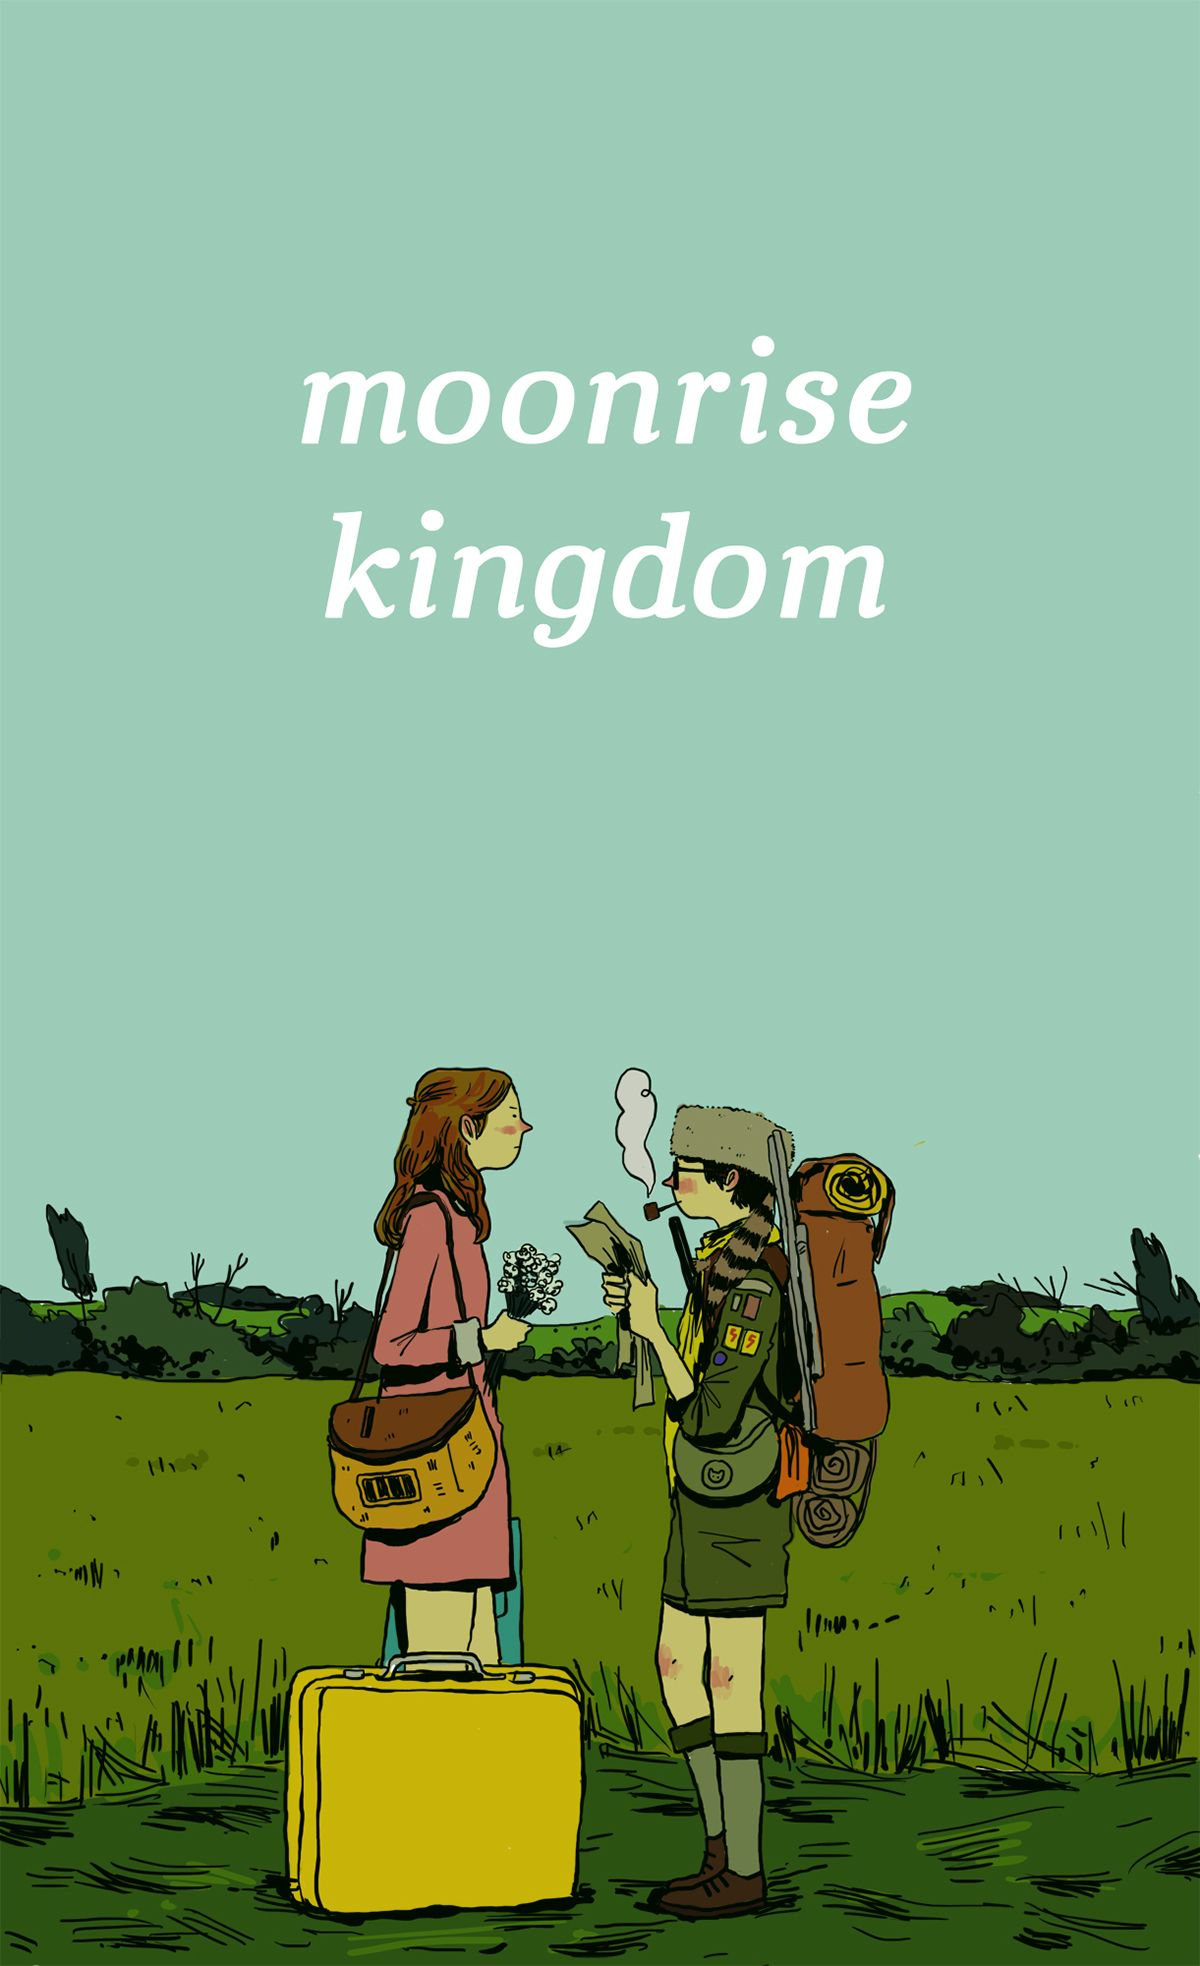 Moonrise Kingdom on Behance